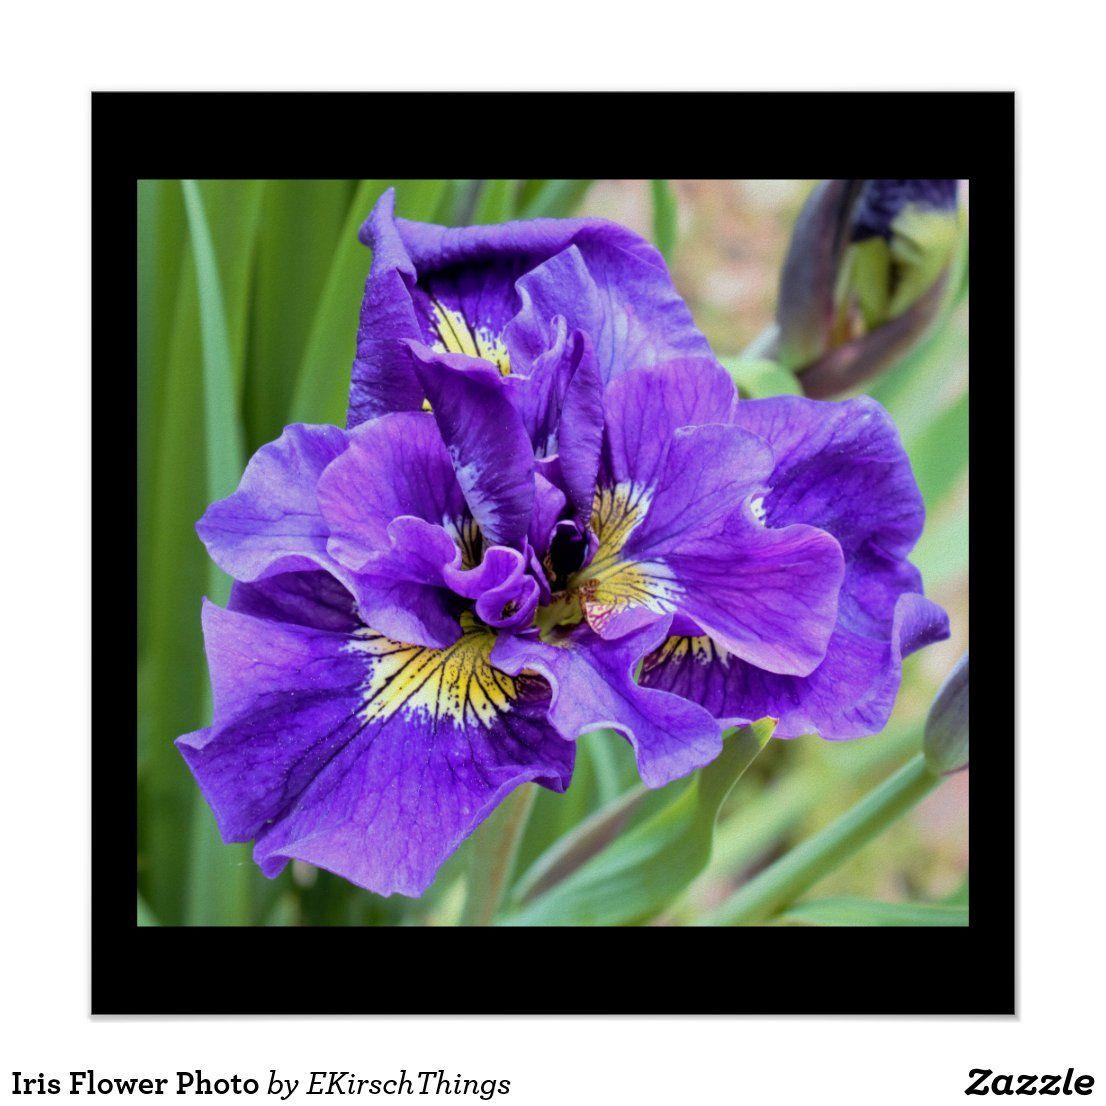 Iris Flower Photo Poster Zazzle Com In 2020 Iris Flower Photos Iris Flowers Photo Posters